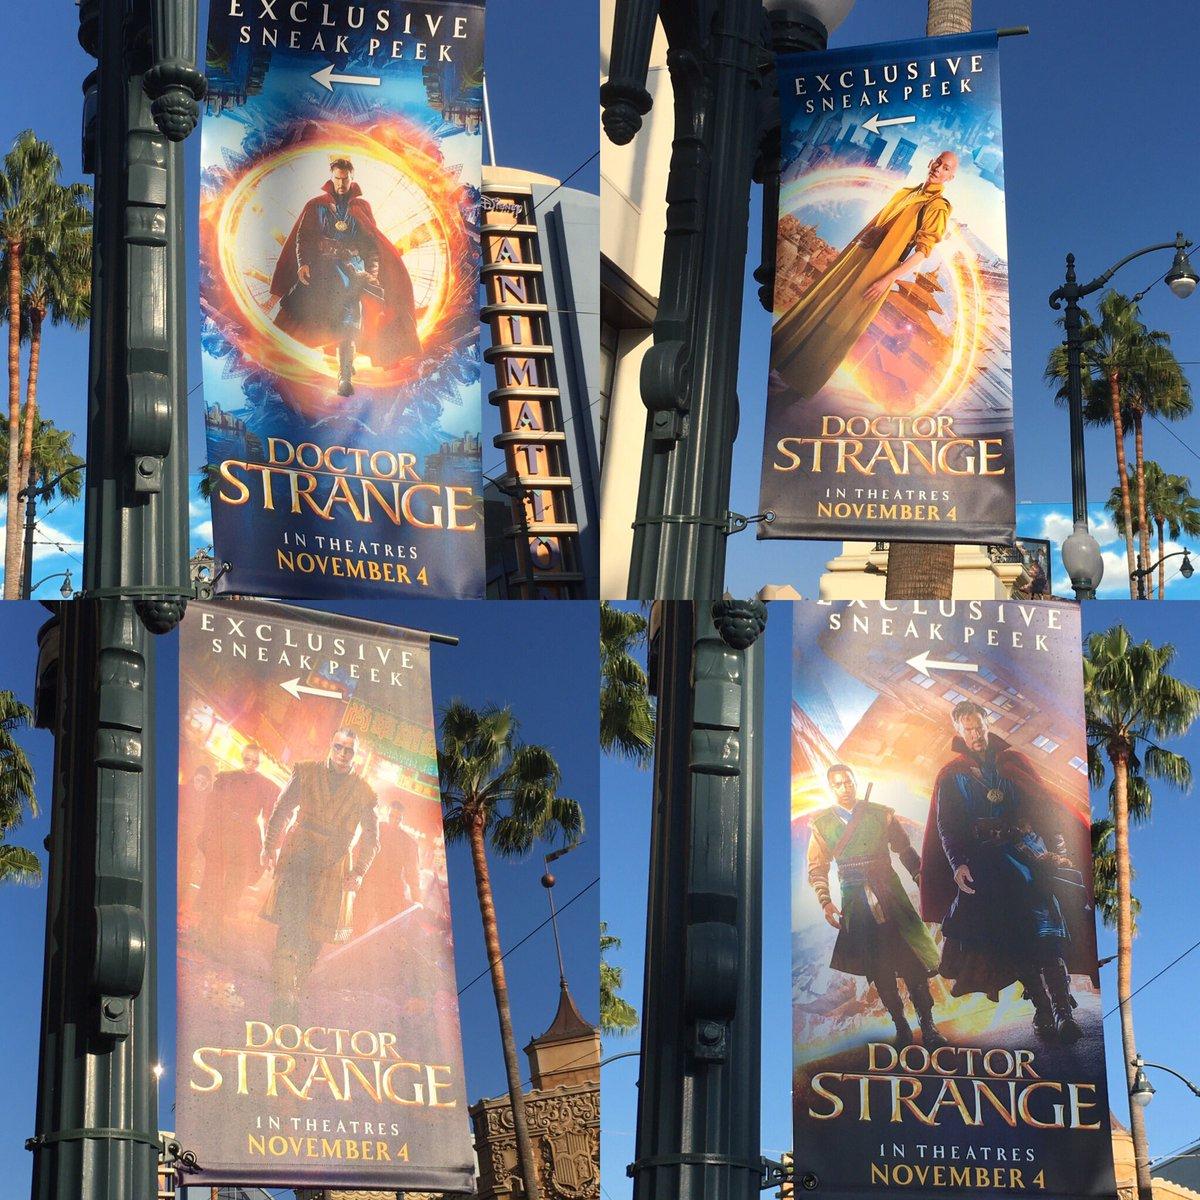 #DoctorStrange banners in #DCA #Marvel #Disneyland https://t.co/WRffaPGBuS